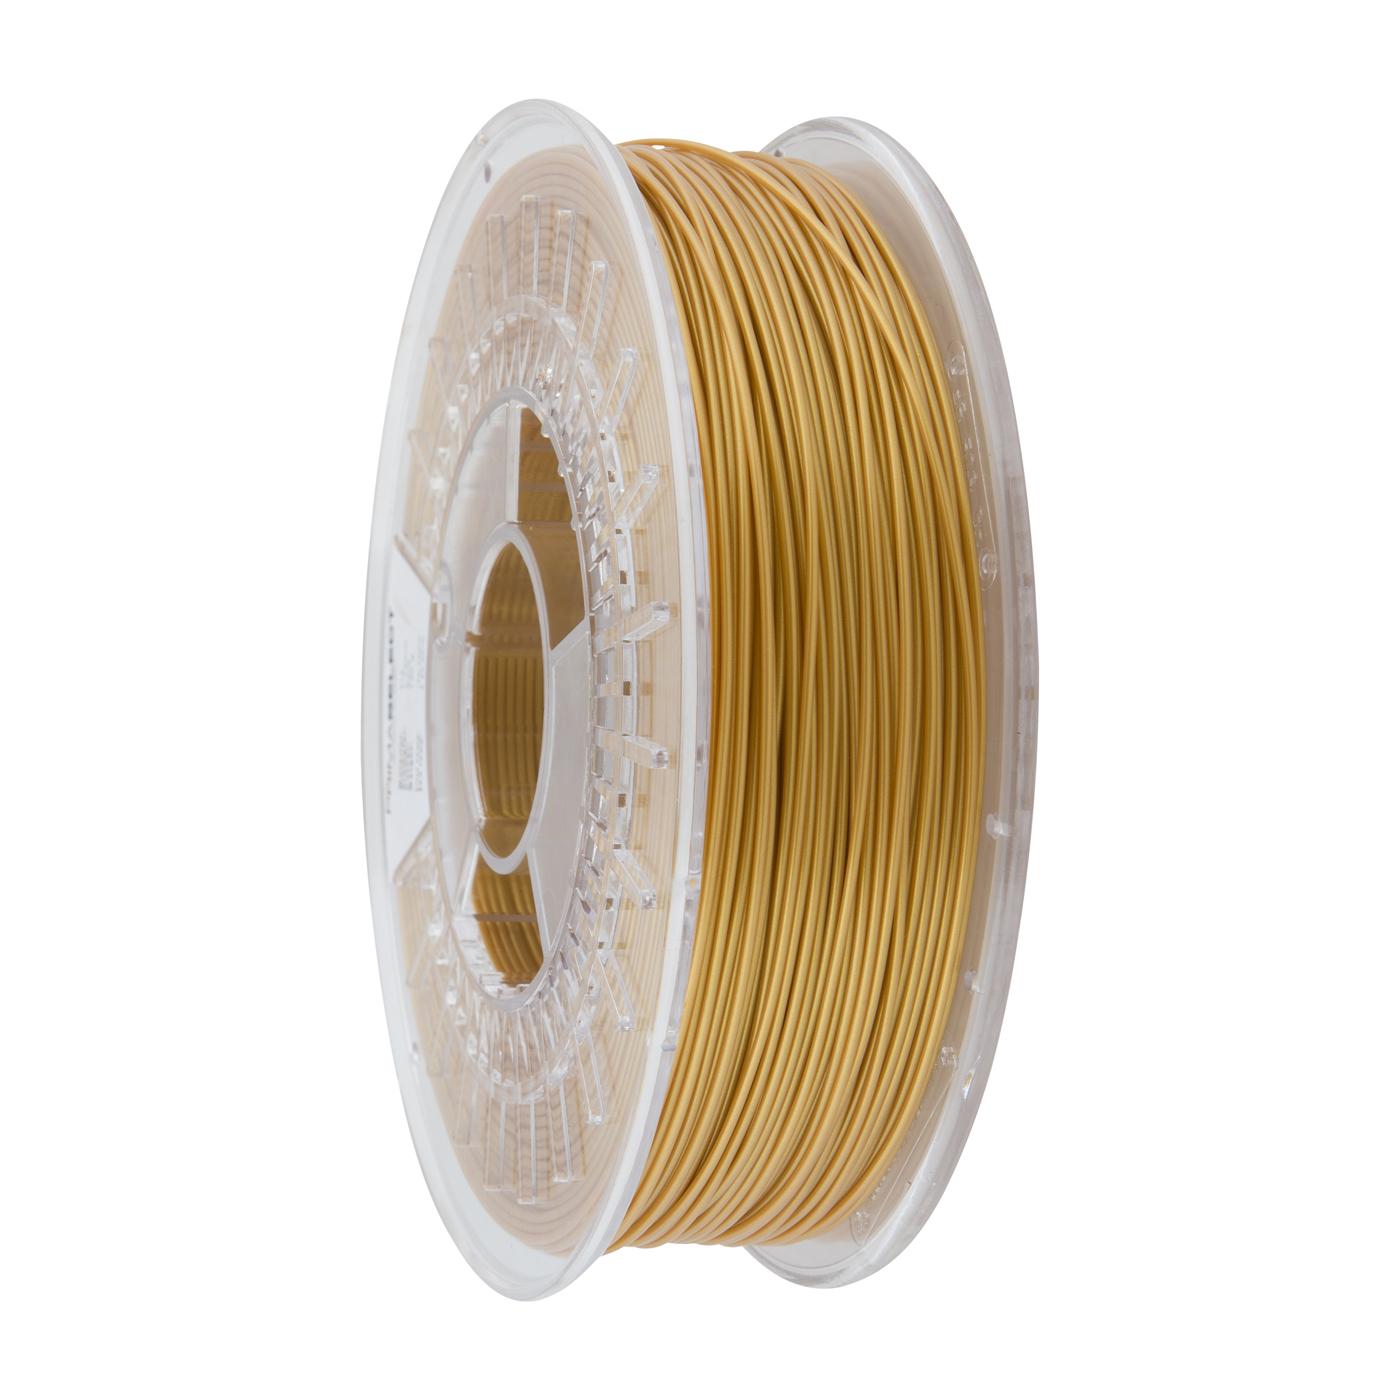 Ubrugte PrimaSelect PLA - 1.75mm - 750 g - Guld FILAMENT YA-67